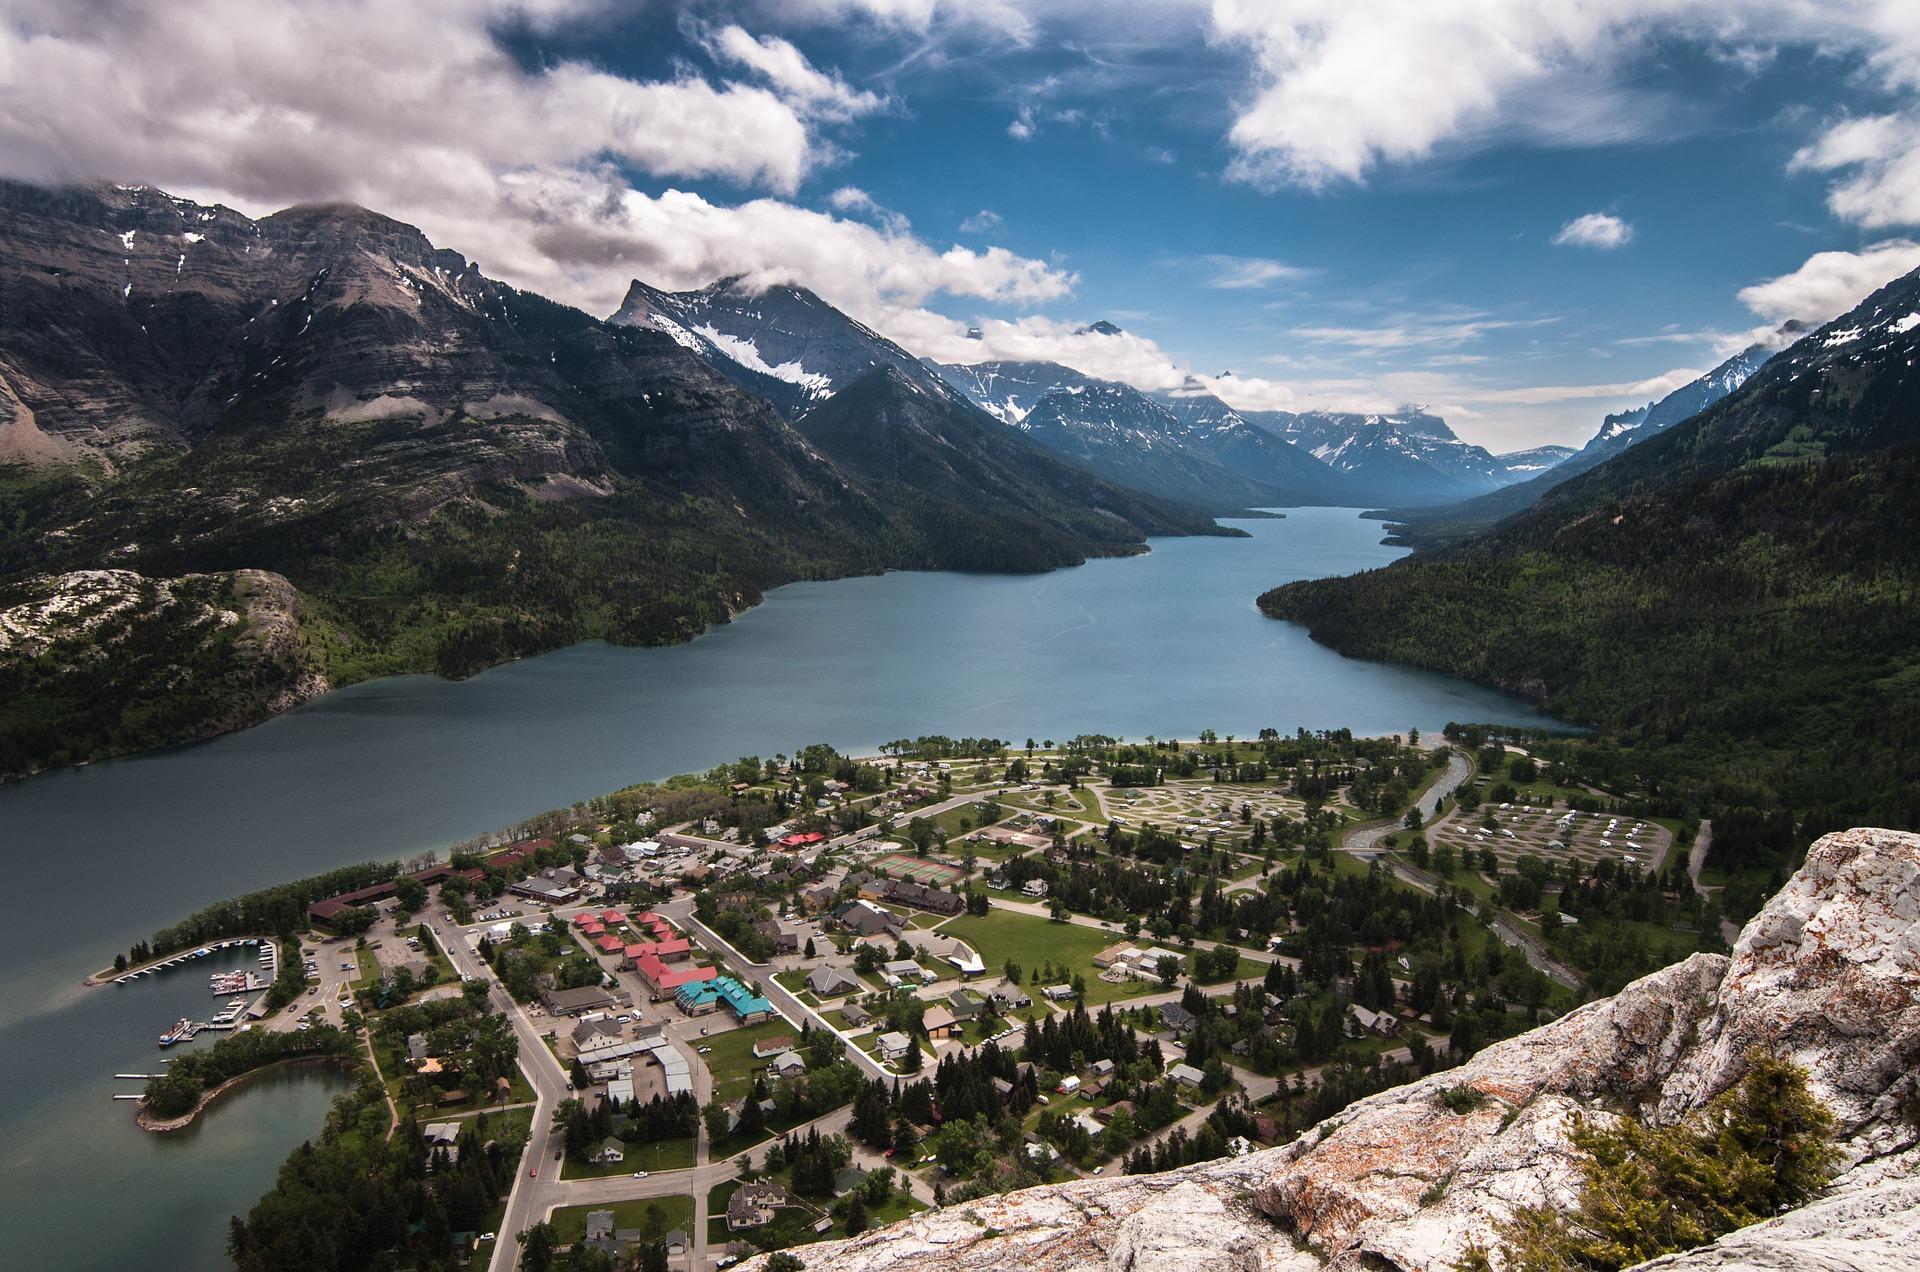 fjord-828990_1920.jpg